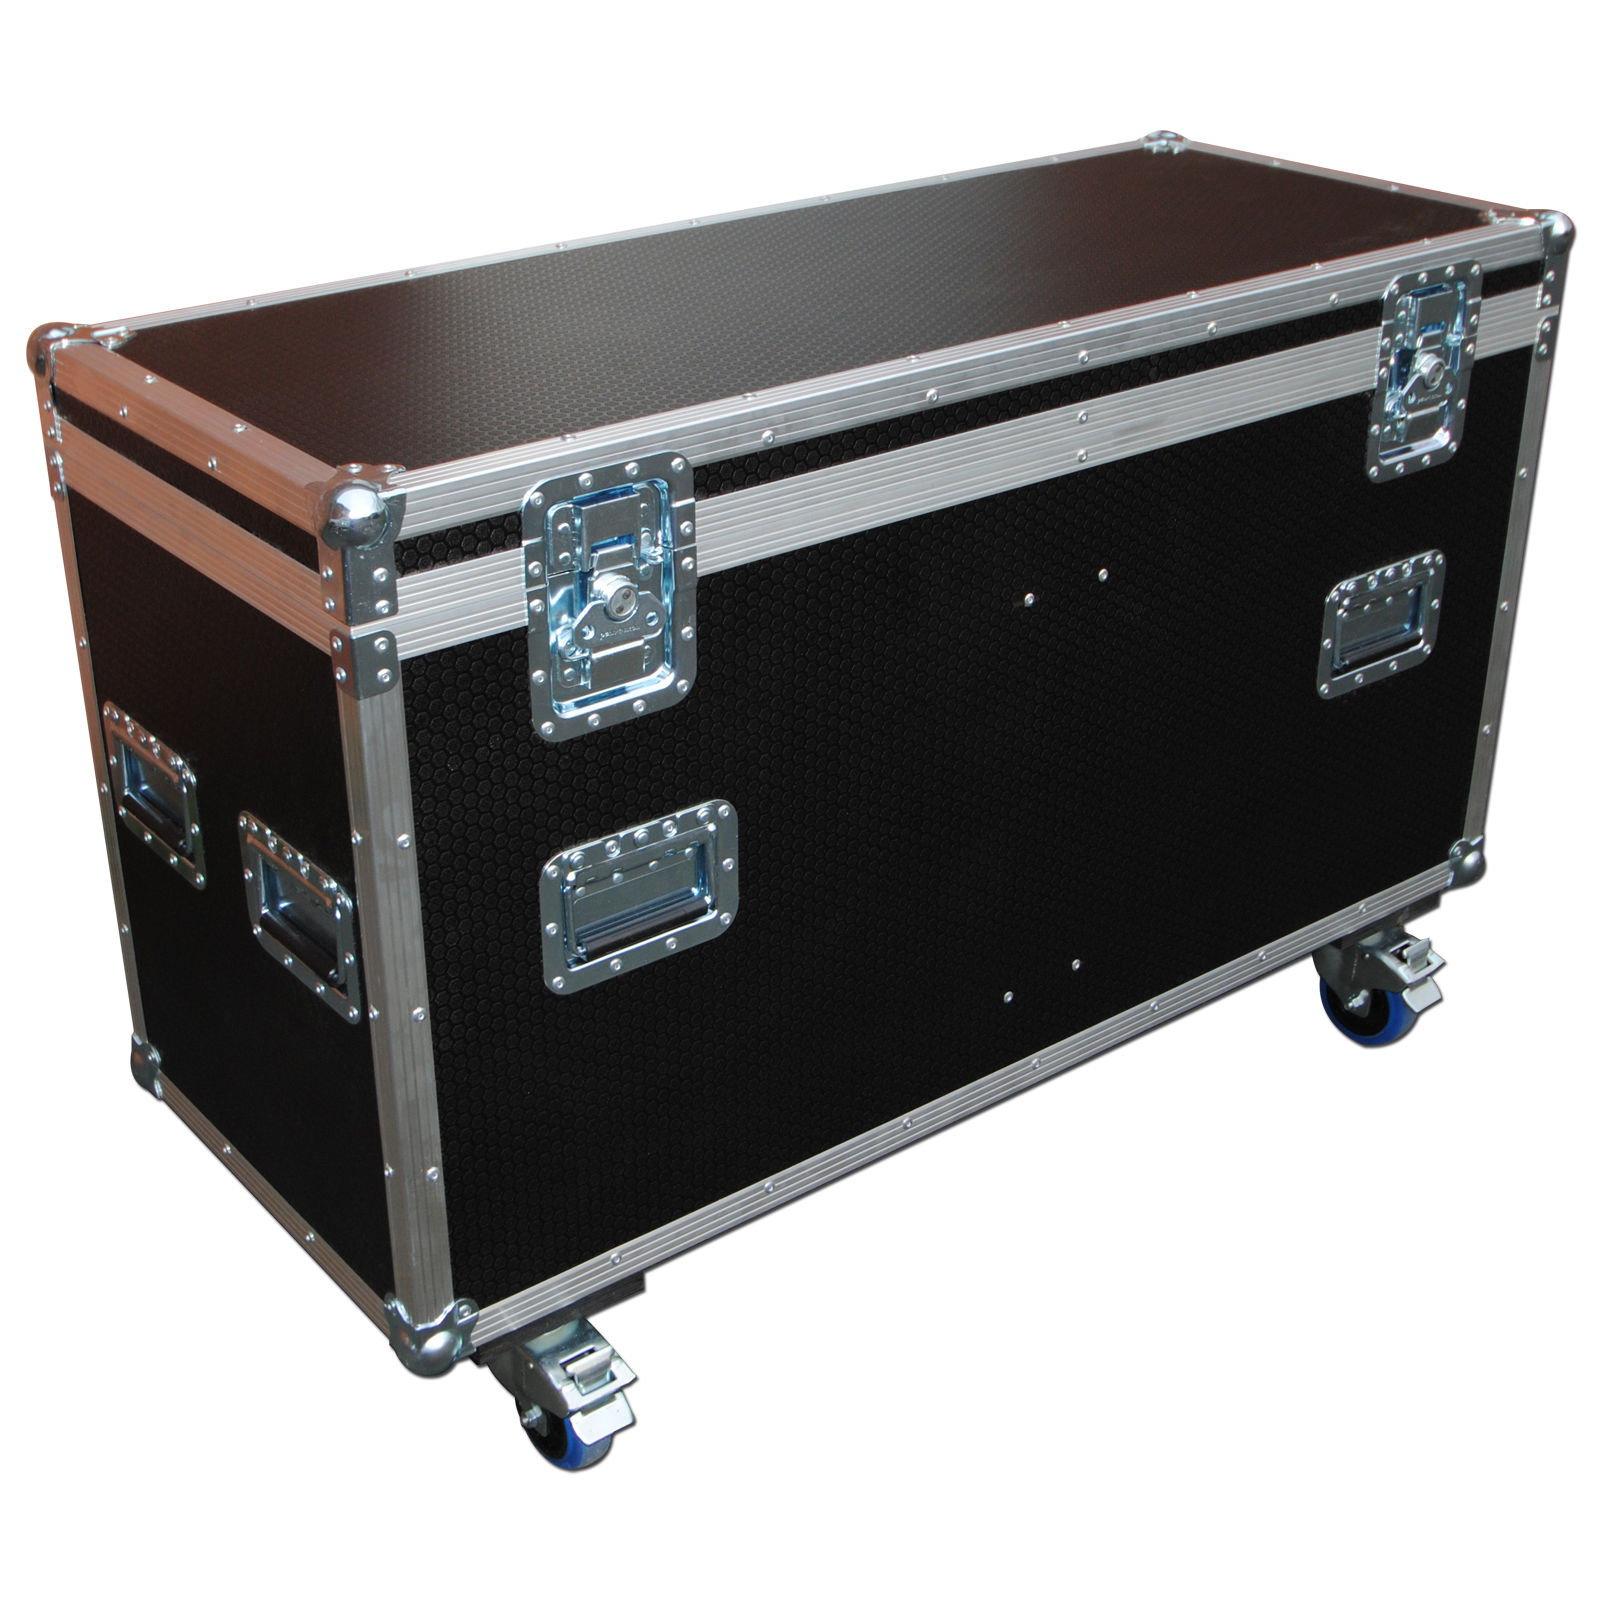 chauvet intimidator spot led 350 twin moving head flight case. Black Bedroom Furniture Sets. Home Design Ideas